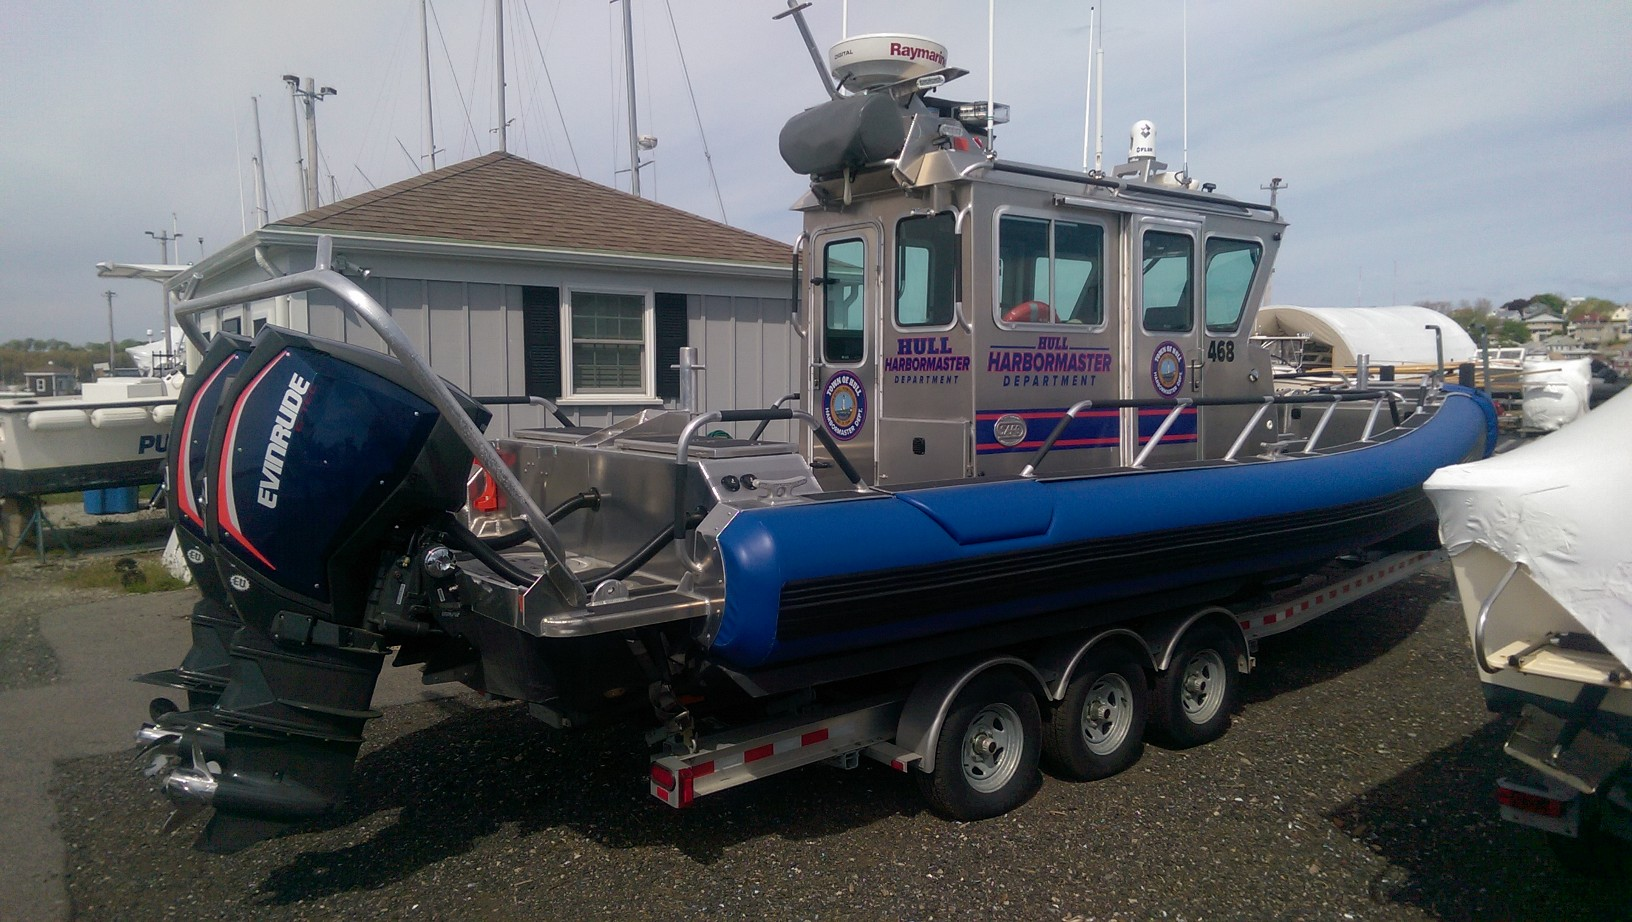 IMAG00602_HullHarborMaster_new_boat.jpg